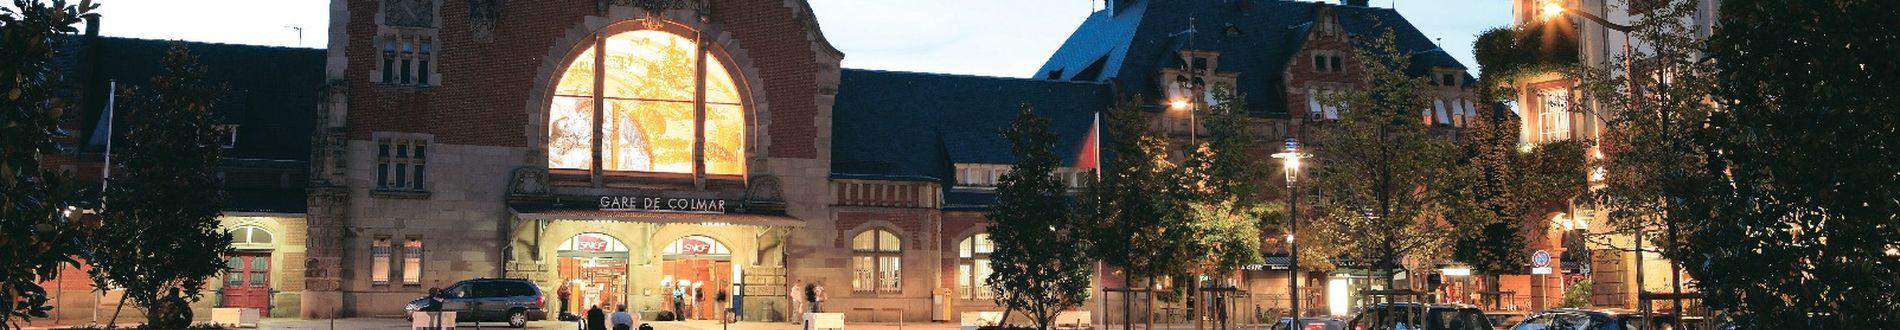 Grand hôtel bristol in Colmar